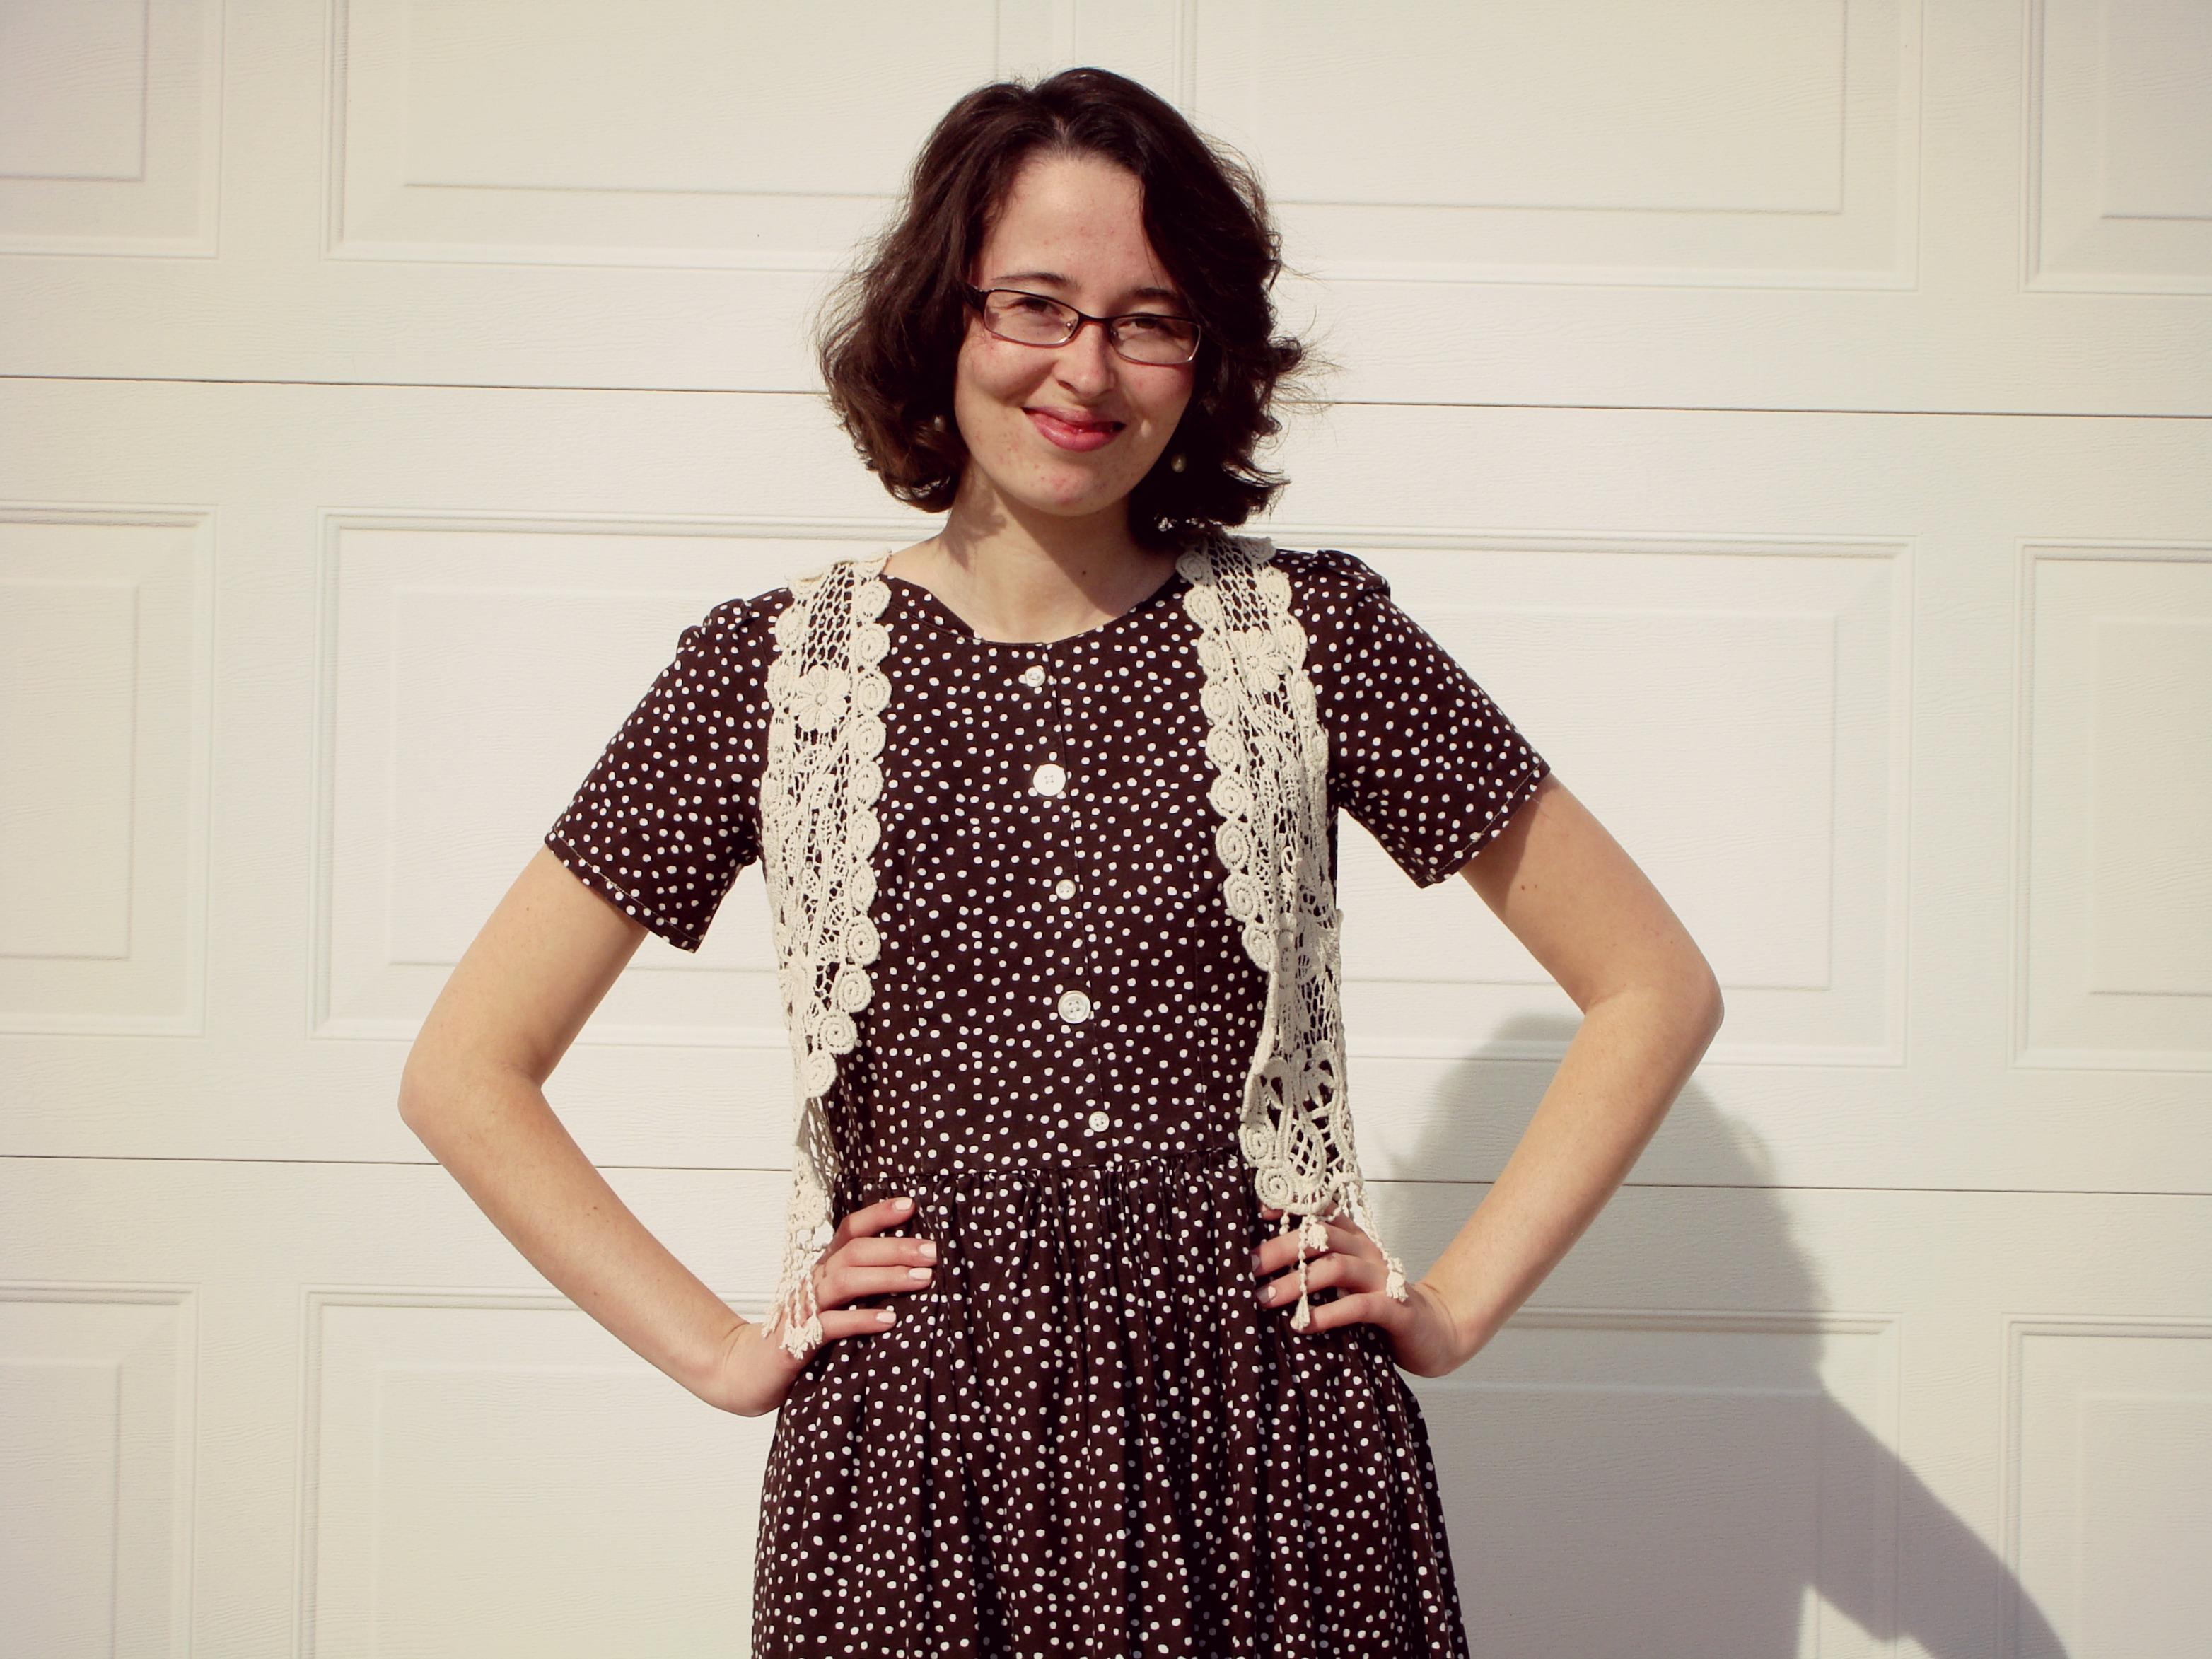 1960s // Vintage Inspired // Polka Dots